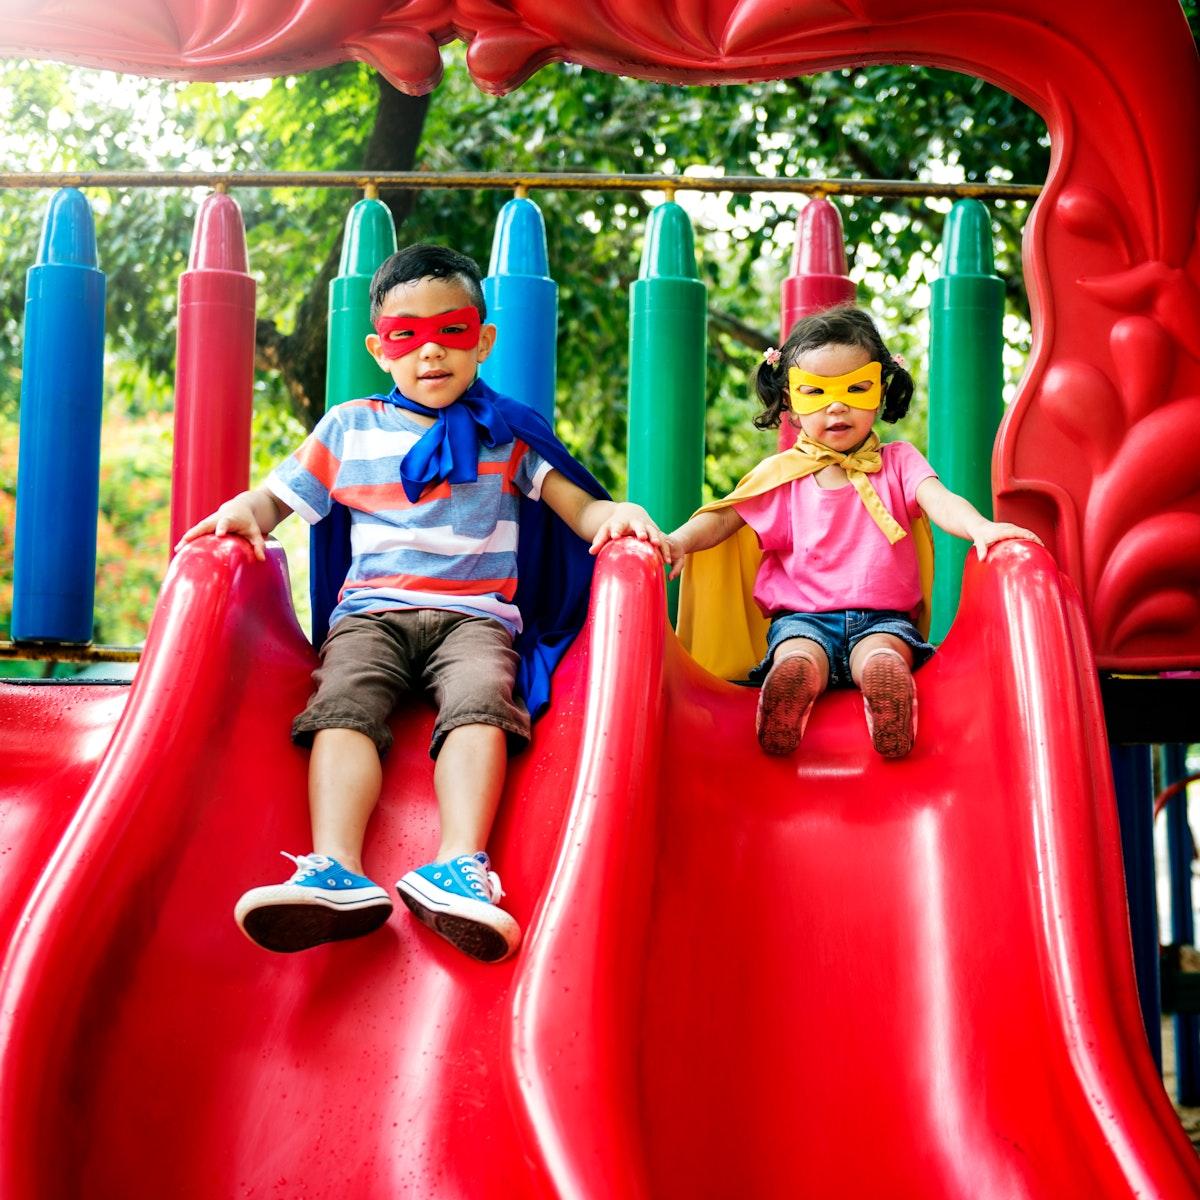 Brother Sister Girl Boy Kid Joy Playful Leisure Concept